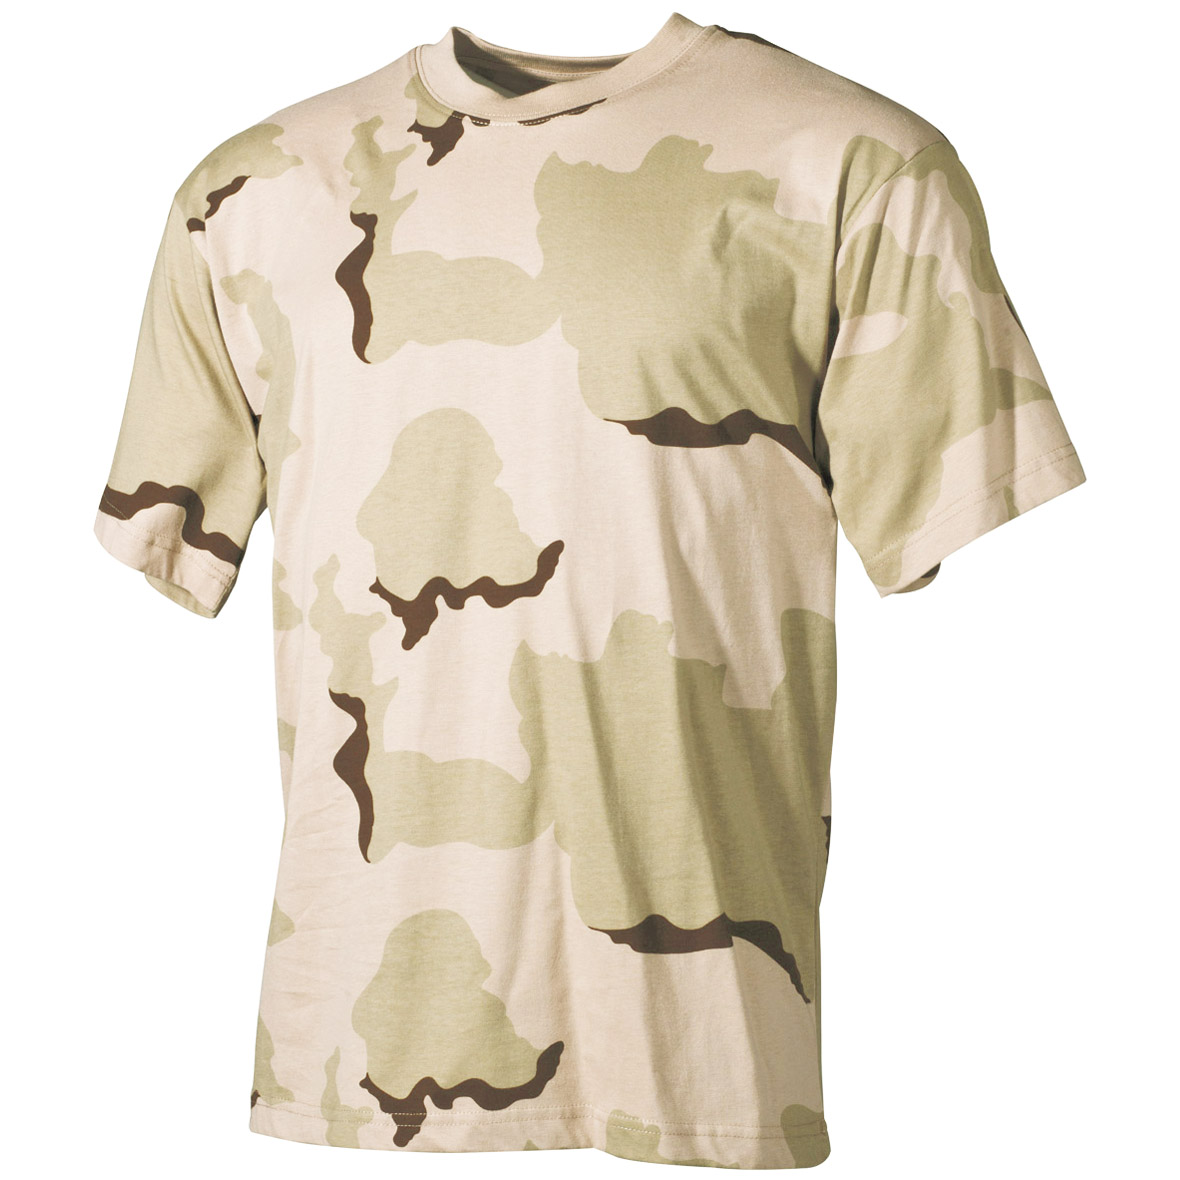 Army Marines Combat Mens T-Shirt Military Top Digital Desert Marpat Camo S-3XL